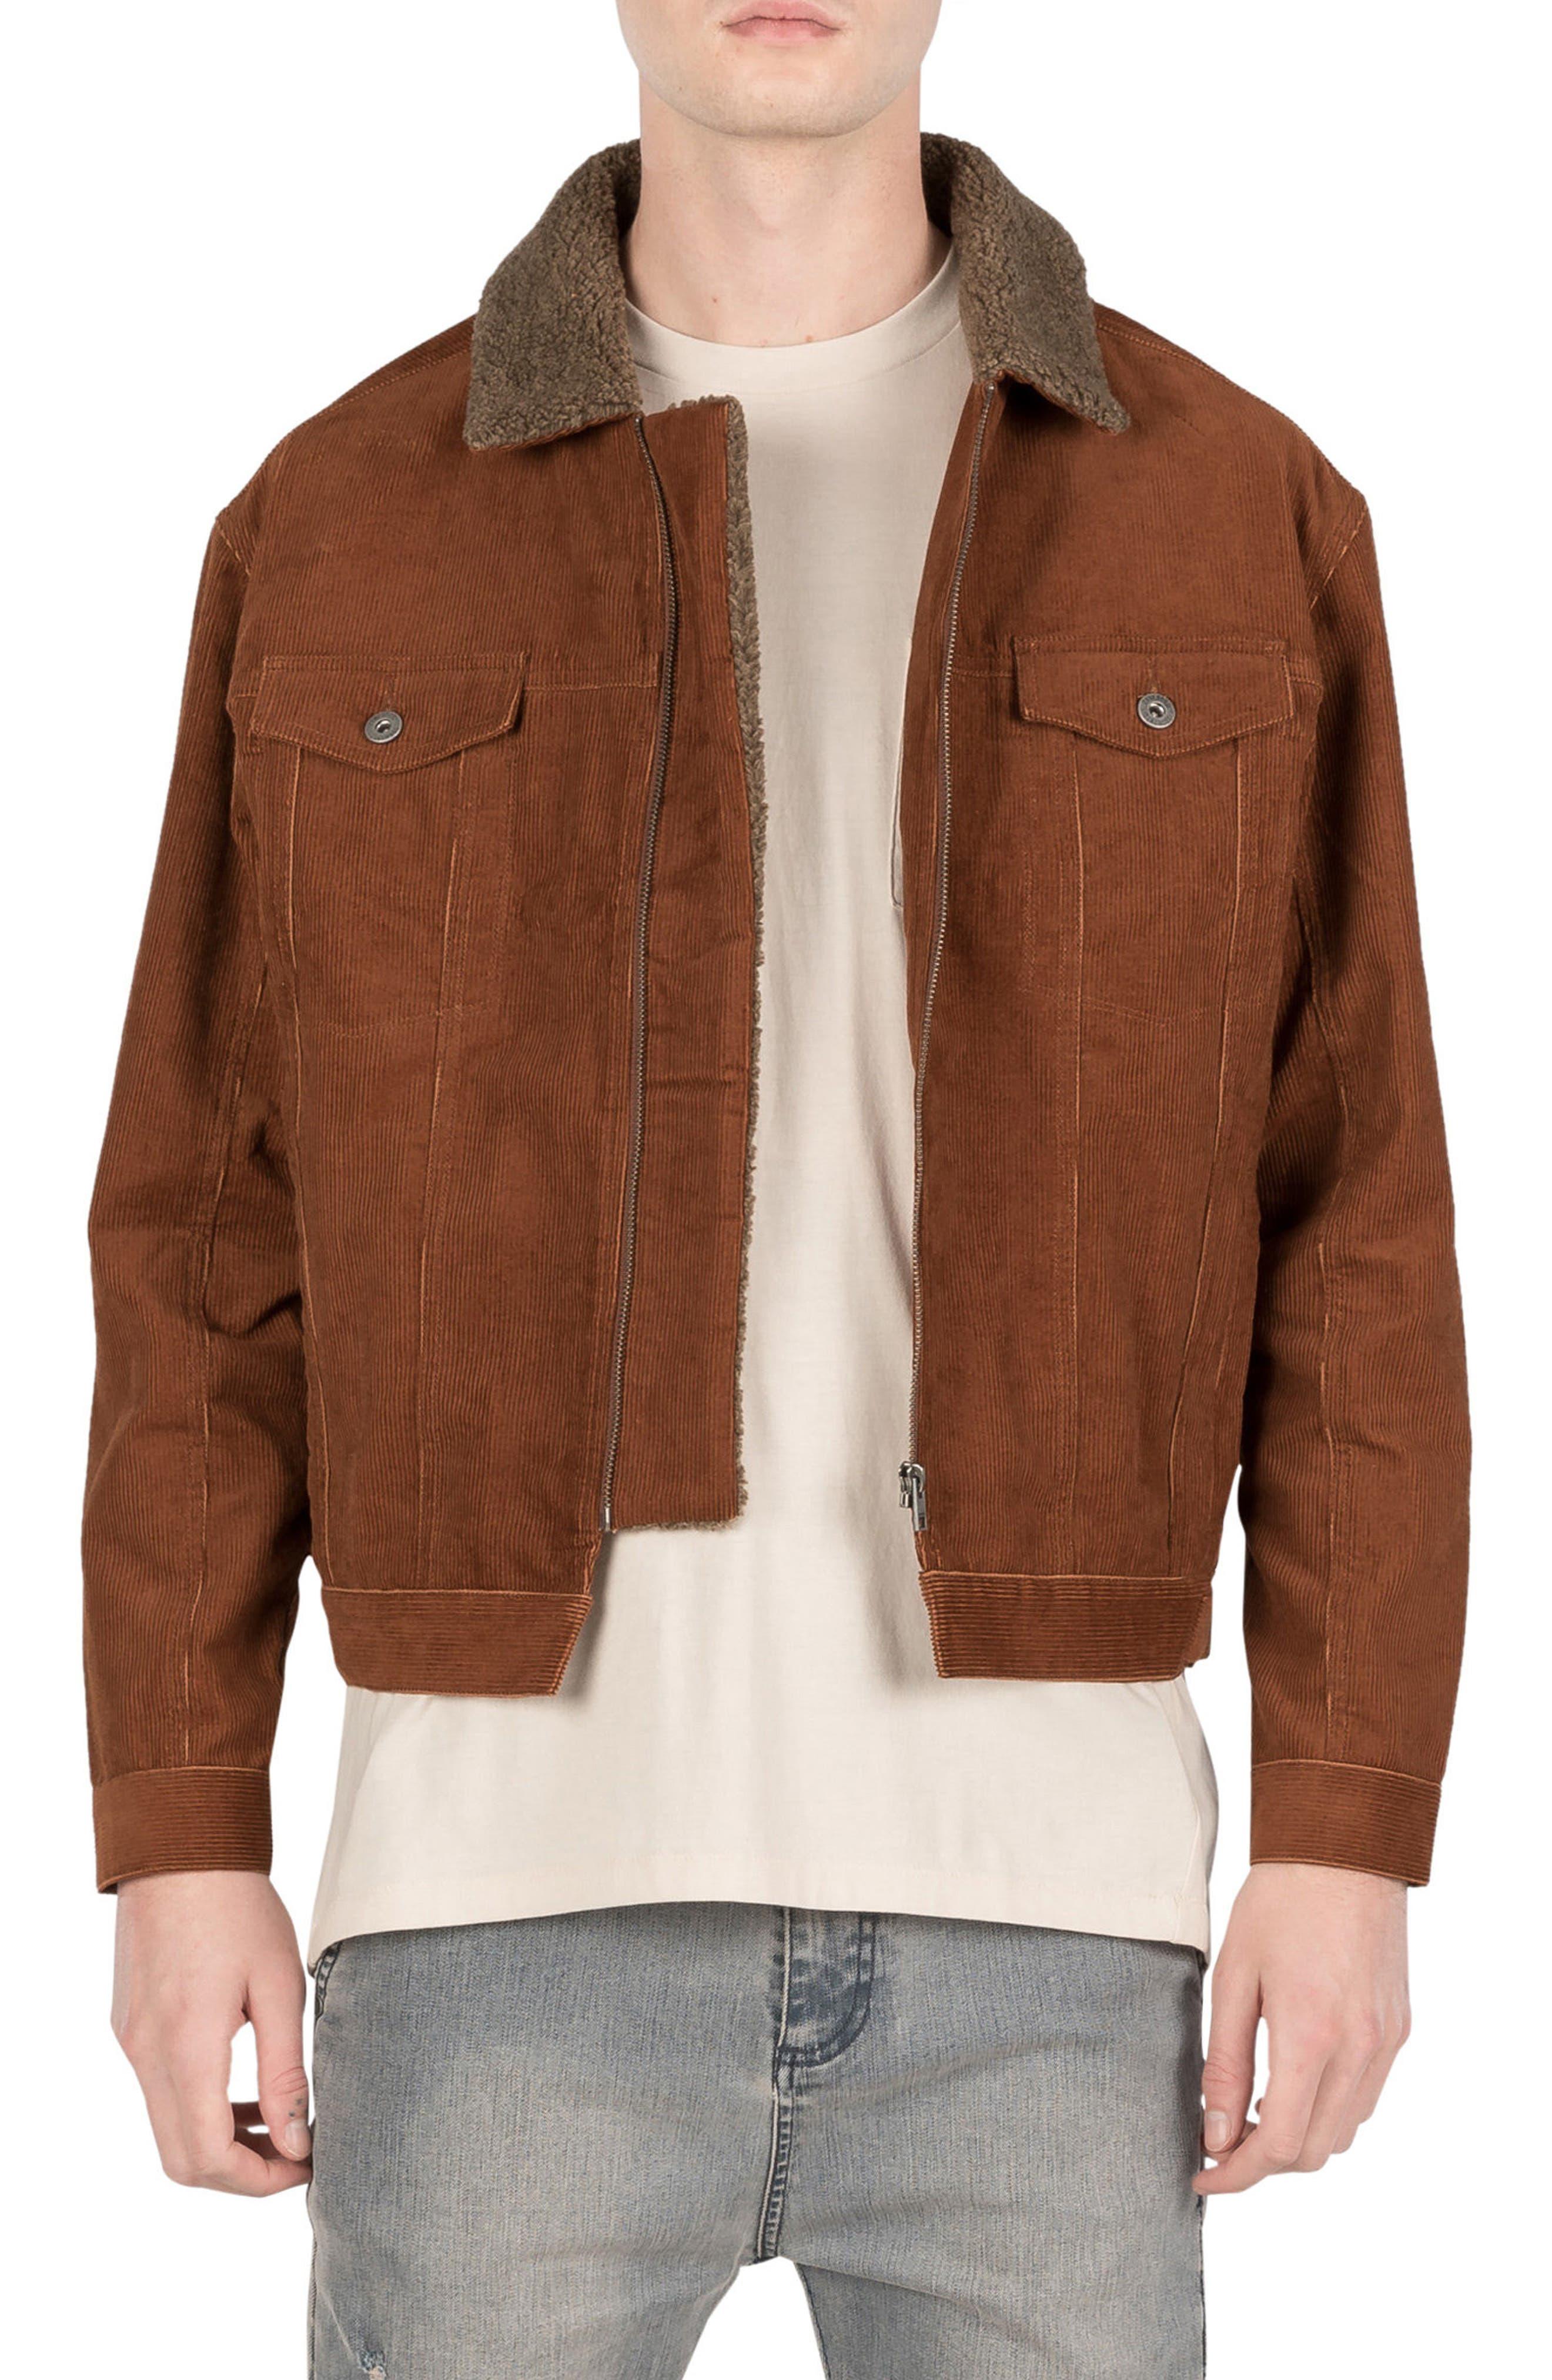 Snitch Corduroy Jacket,                         Main,                         color, 830